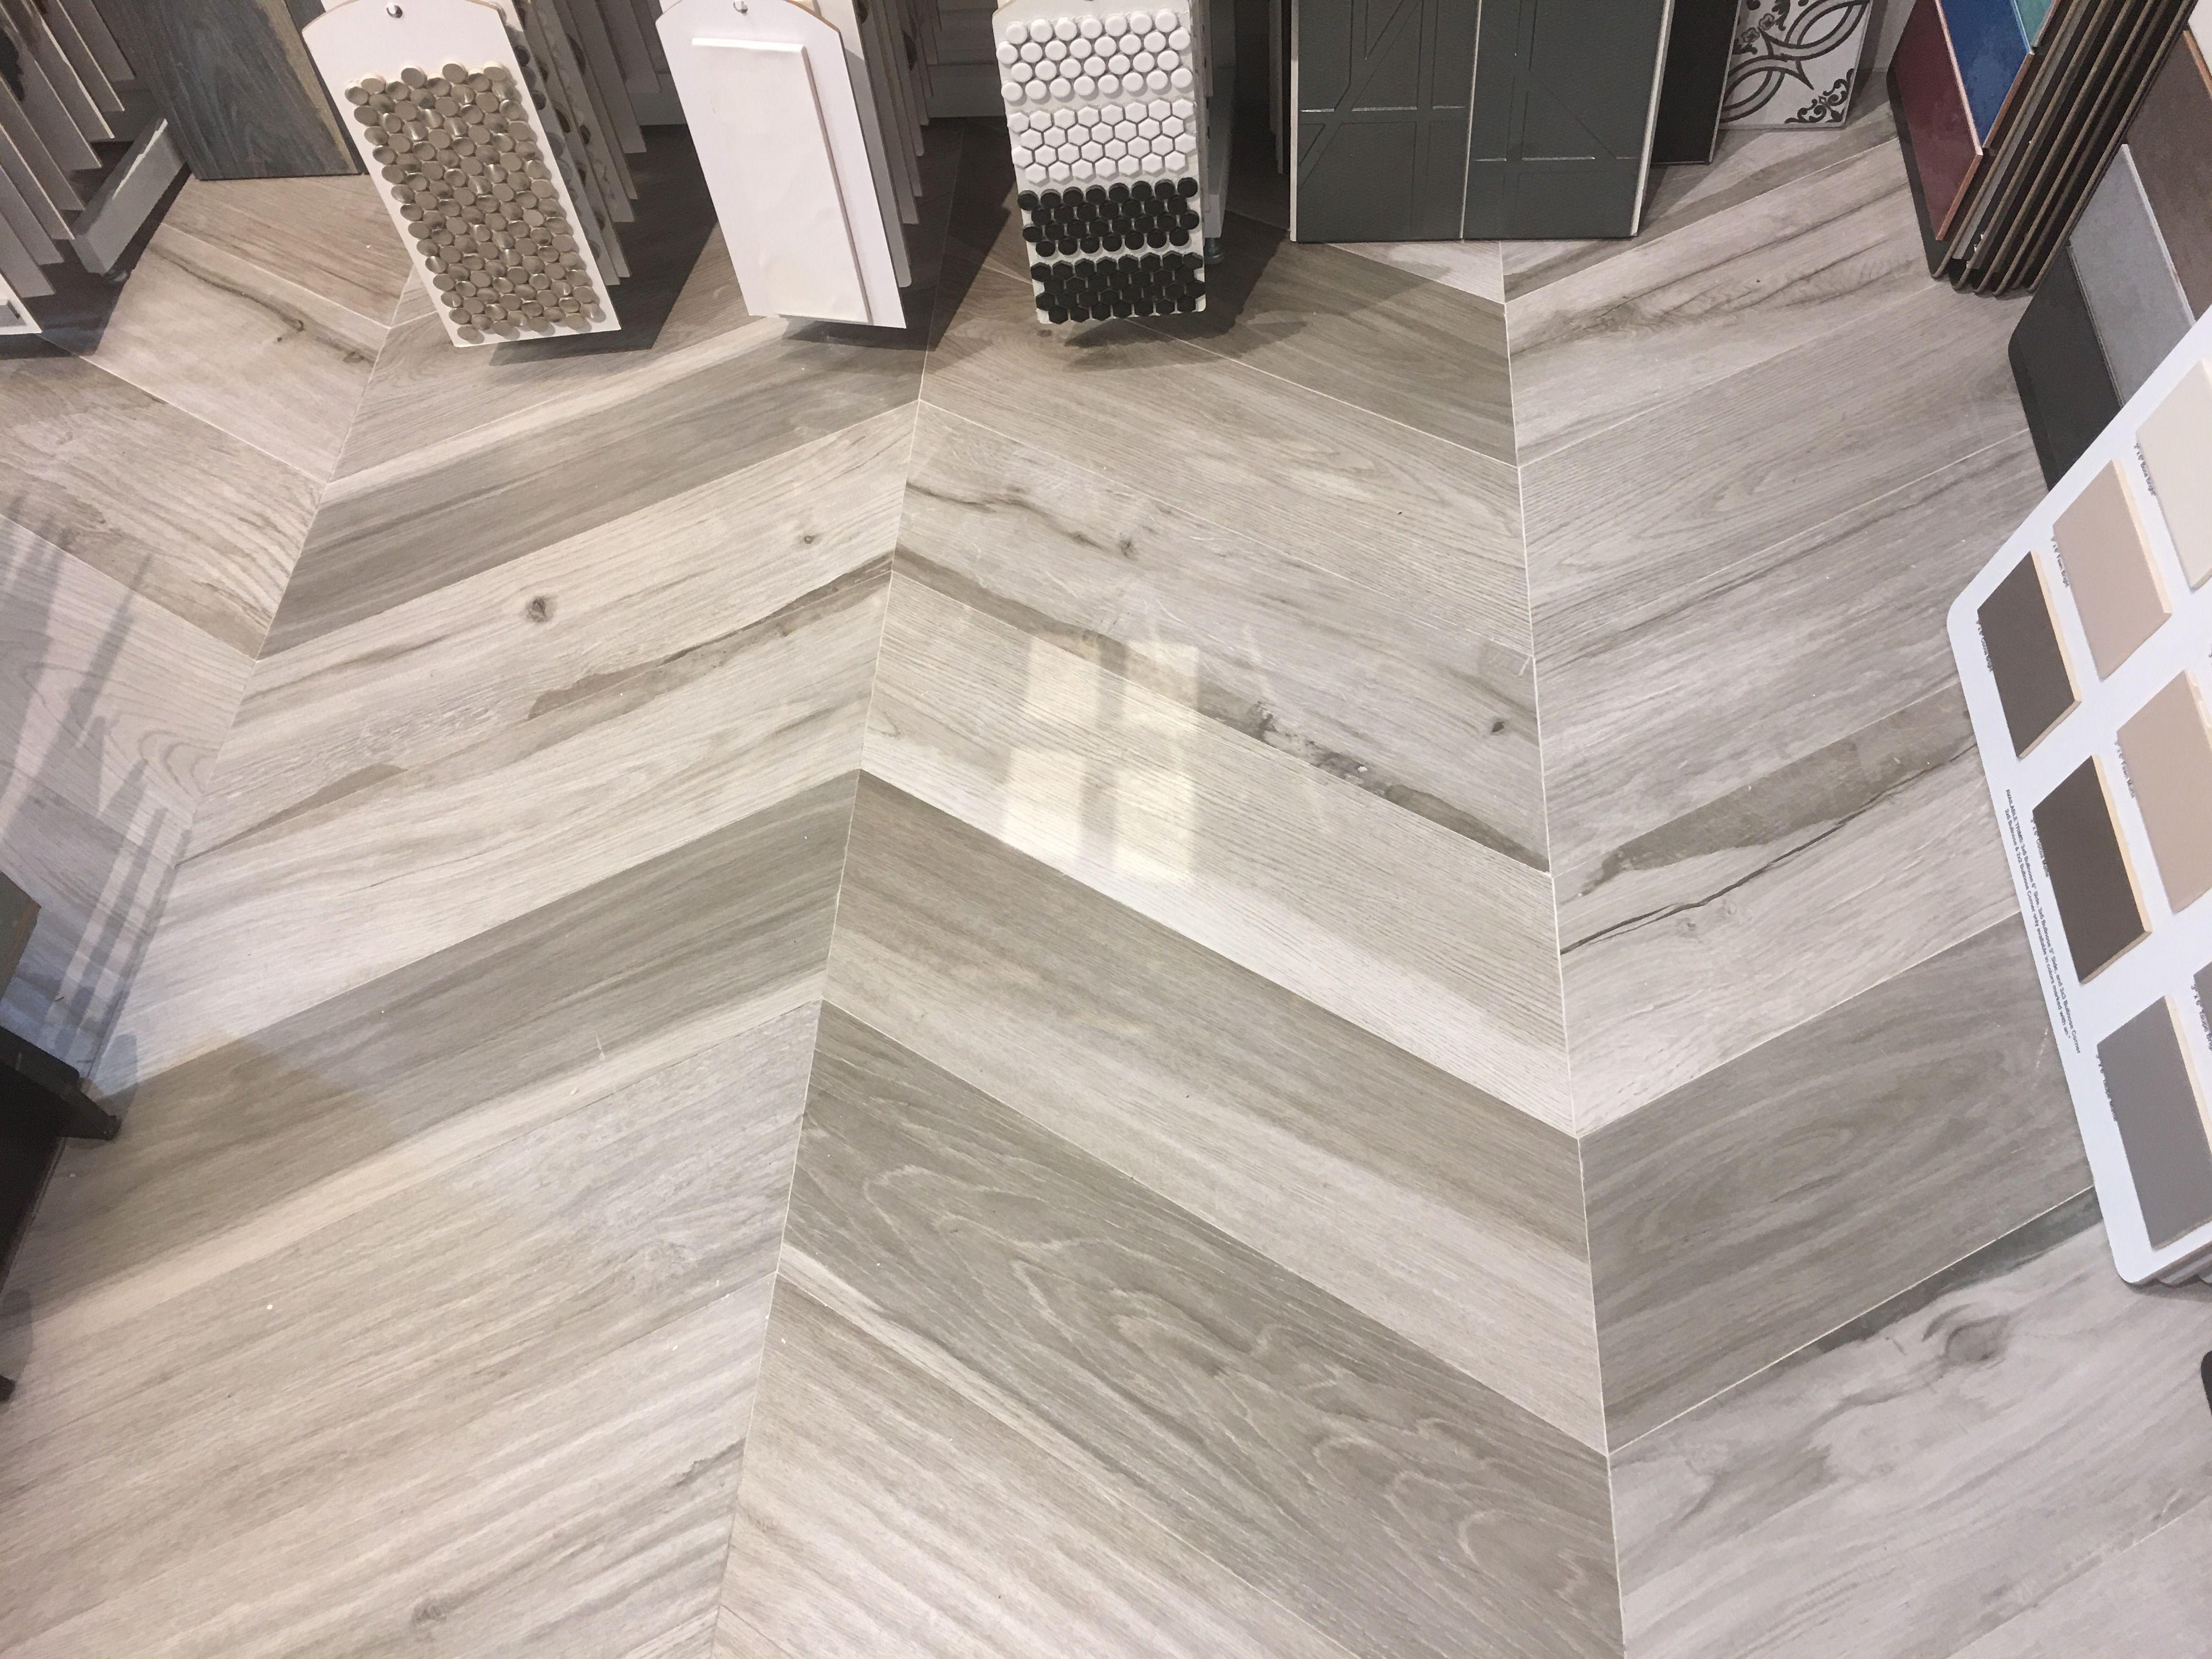 Pin By Angela Lomuscio Trovato On Wood Flooring Wood Floors Hardwood Hardwood Floors